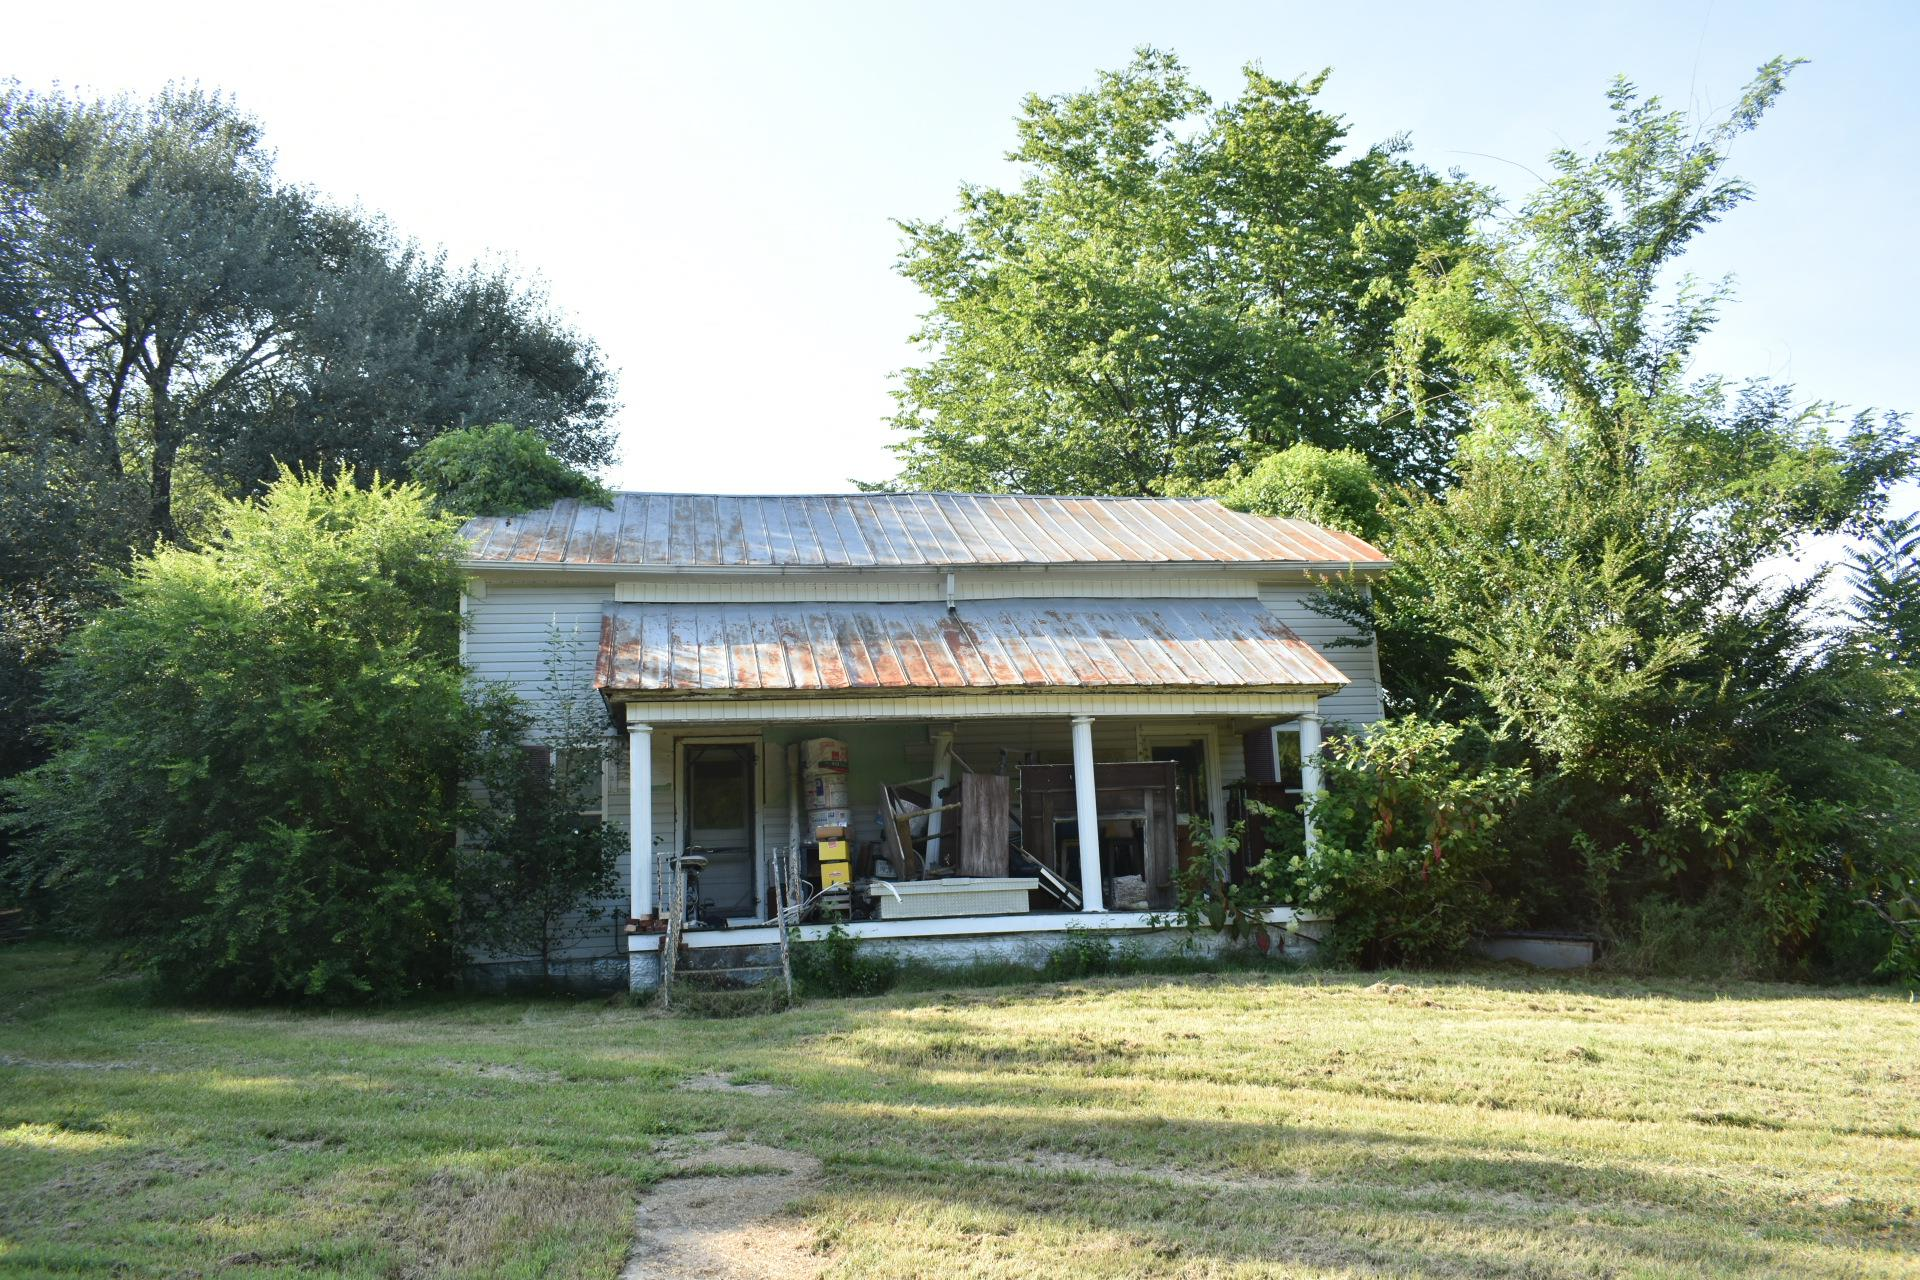 12 Toetown Rd, Pleasant Shade, TN 37145 - Pleasant Shade, TN real estate listing